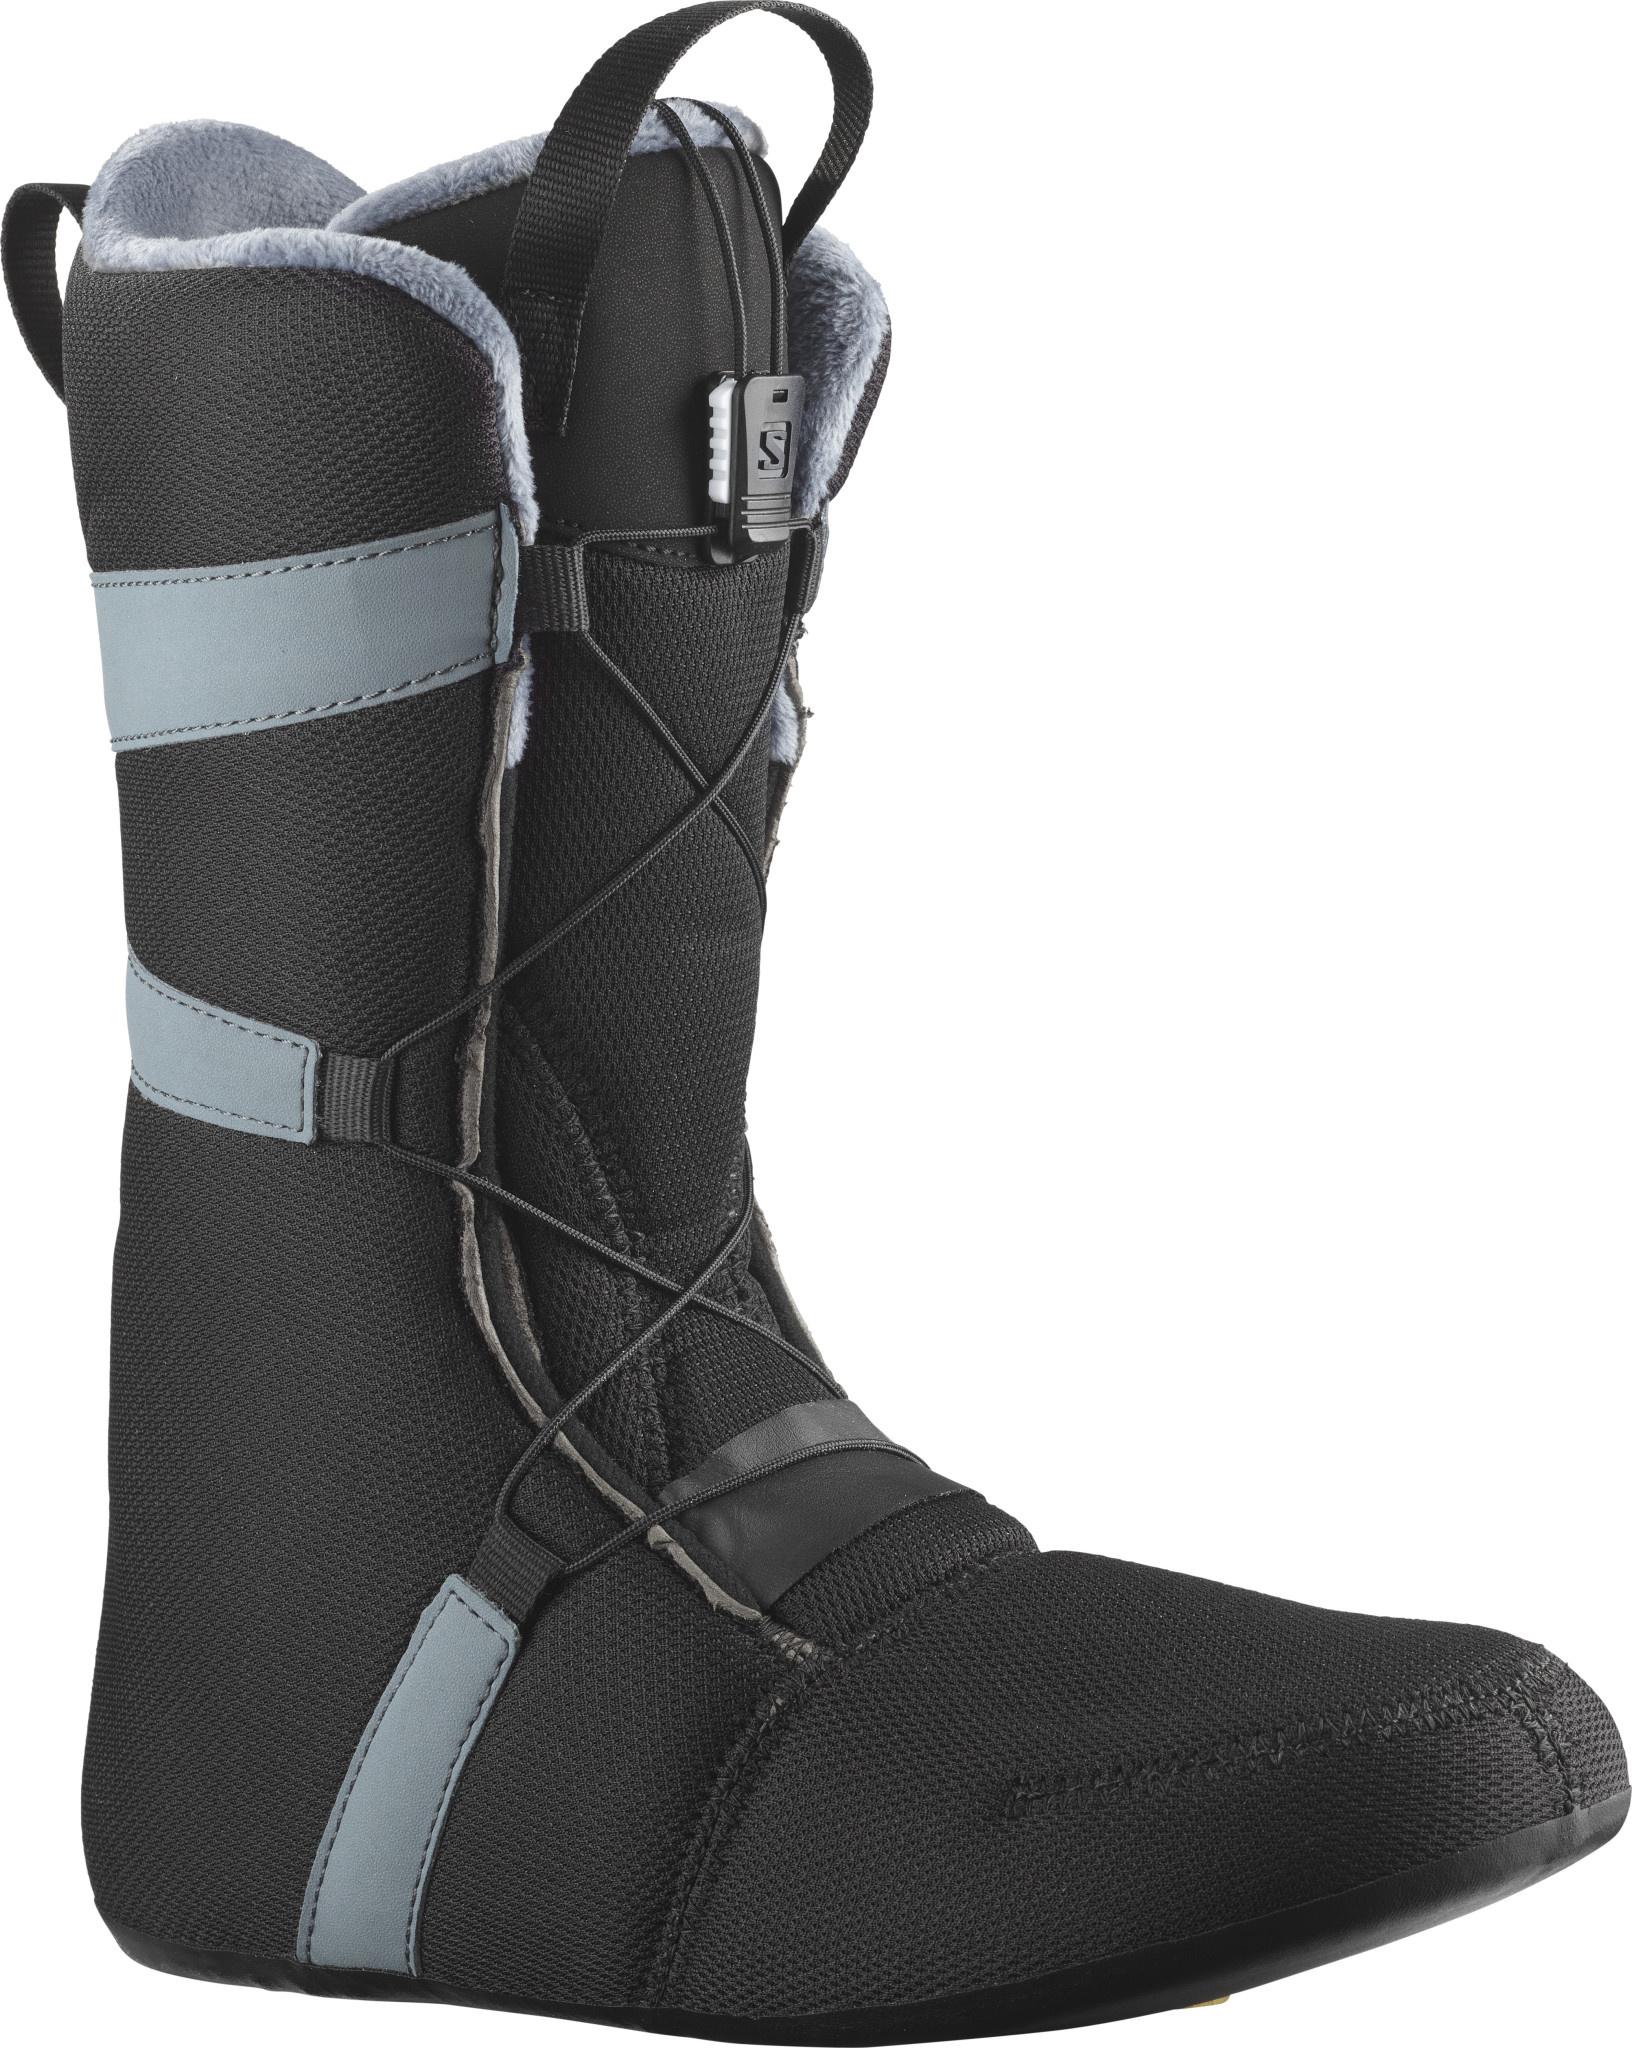 Salomon Snowboard Salomon W's Ivy BOA SJ Snowboard Boot (2022)